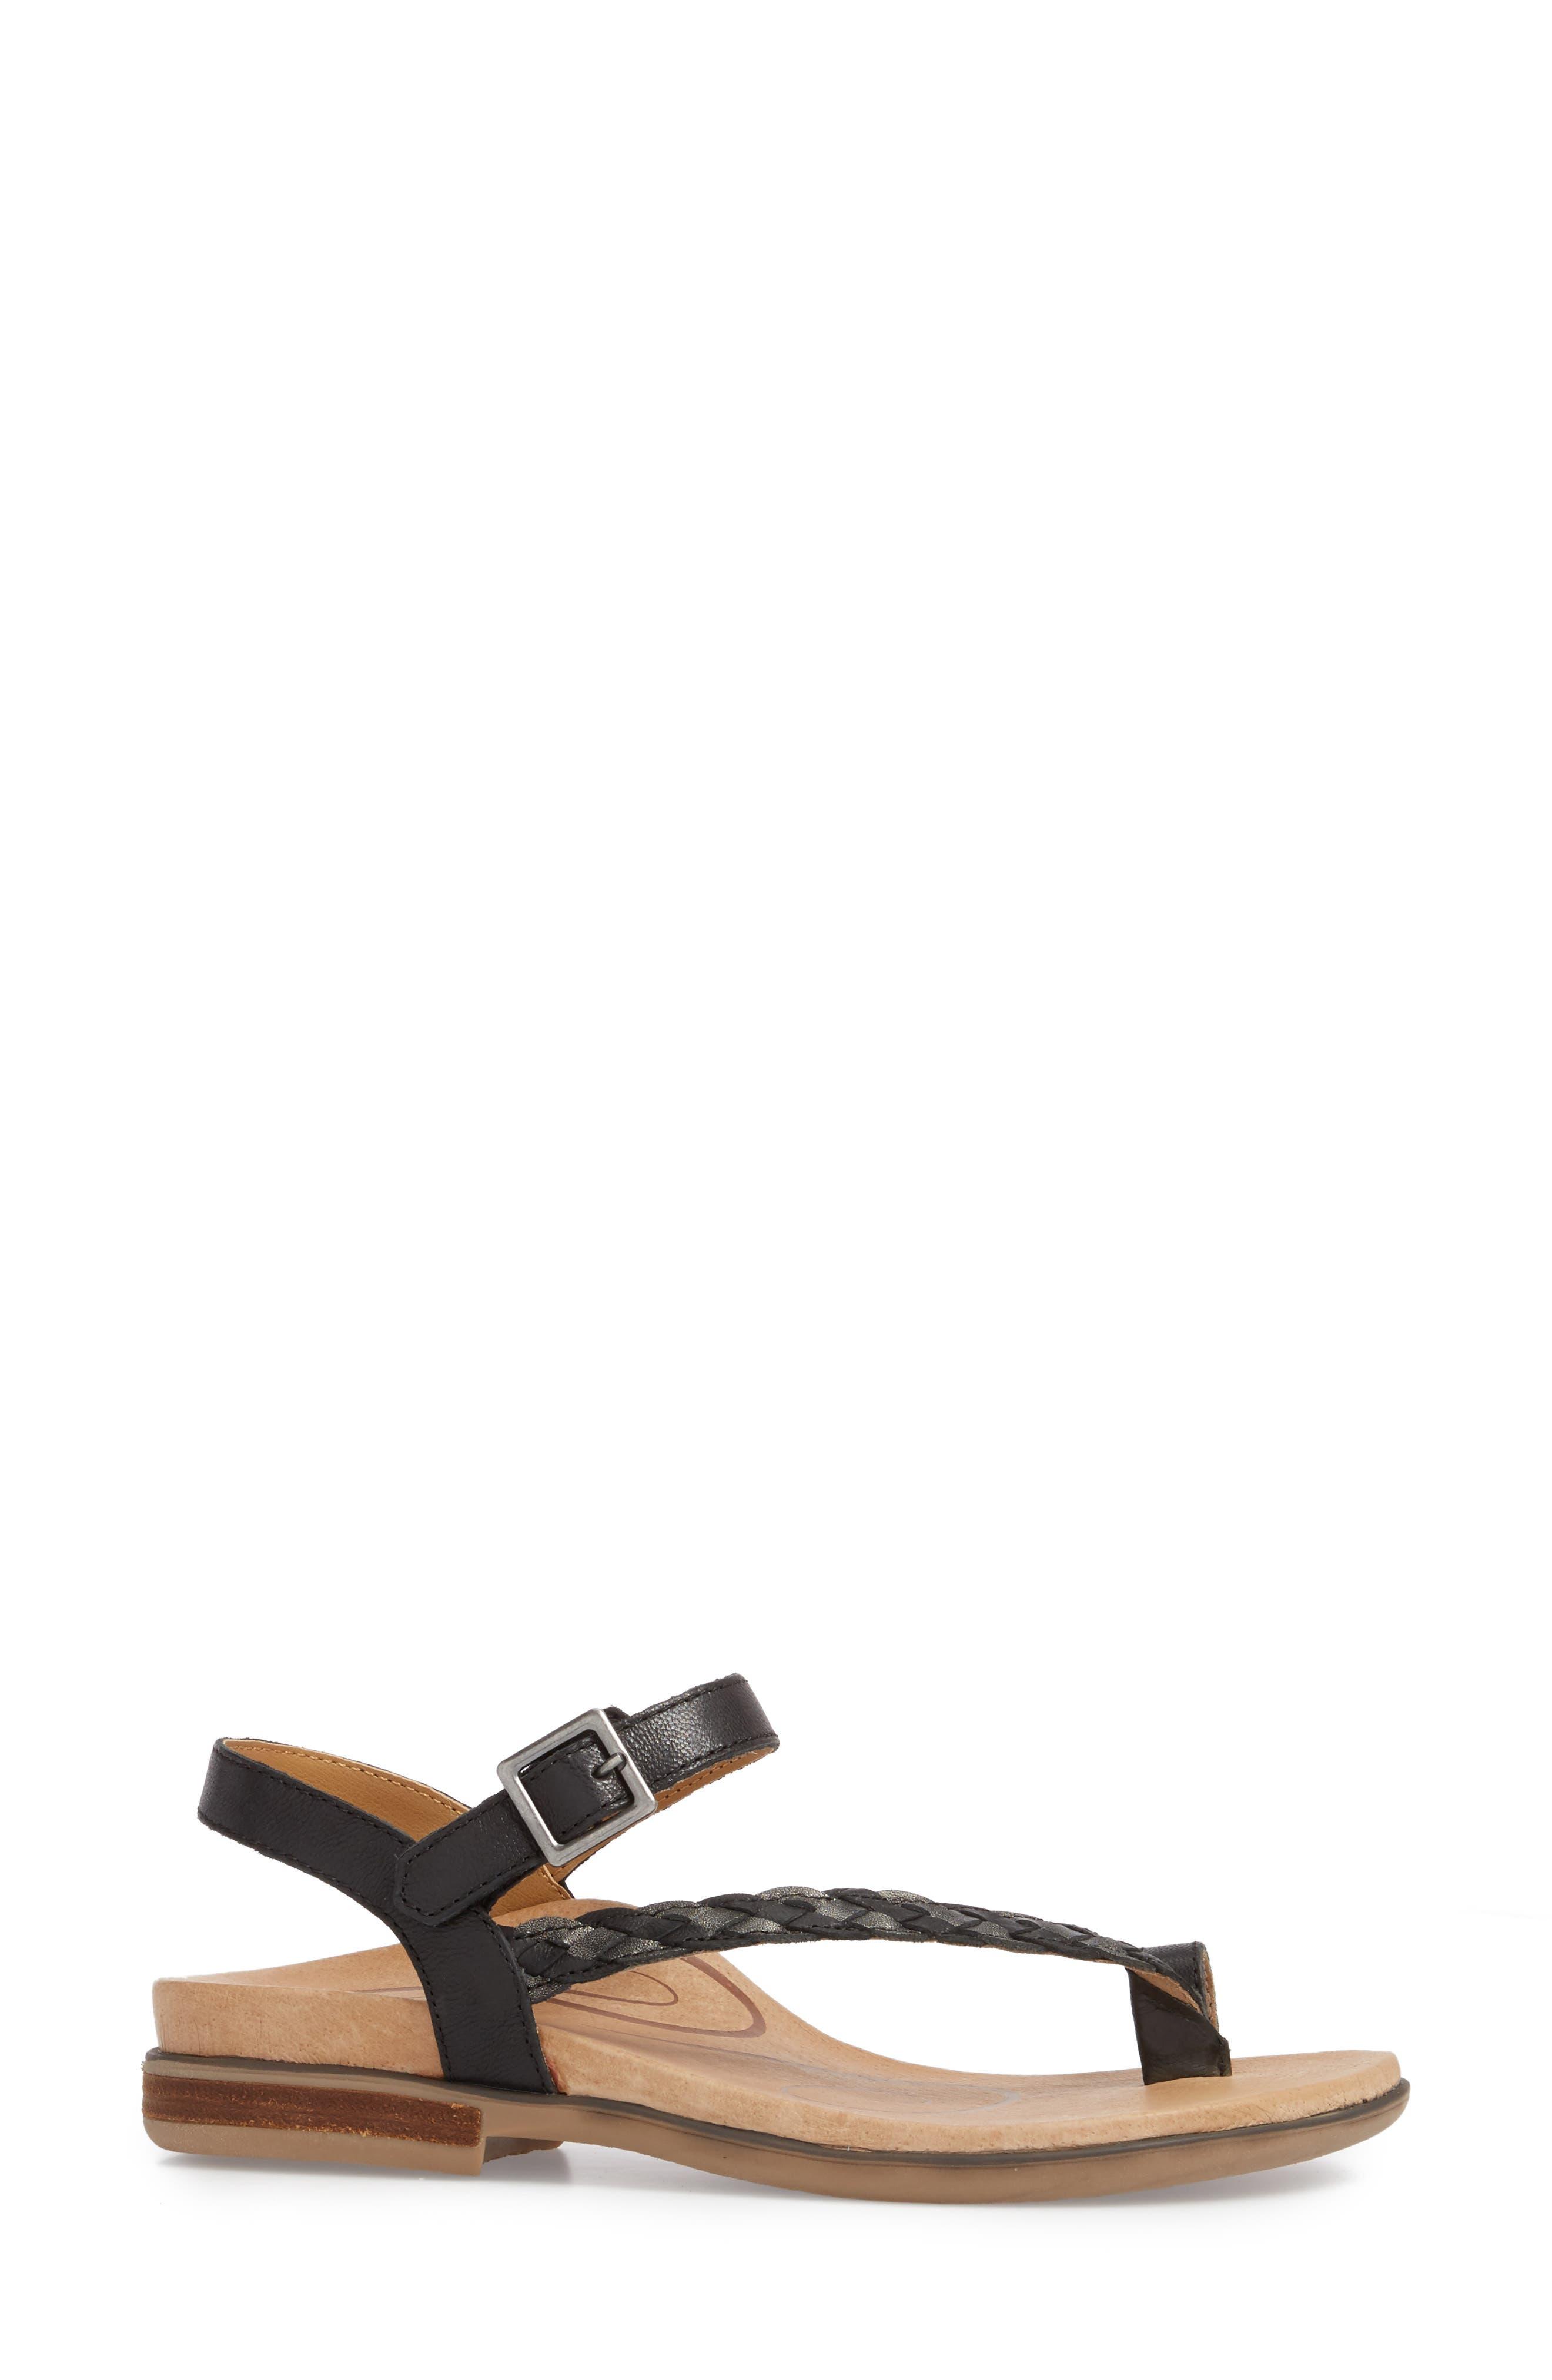 Evie Braided Strap Sandal,                             Alternate thumbnail 3, color,                             BLACK LEATHER